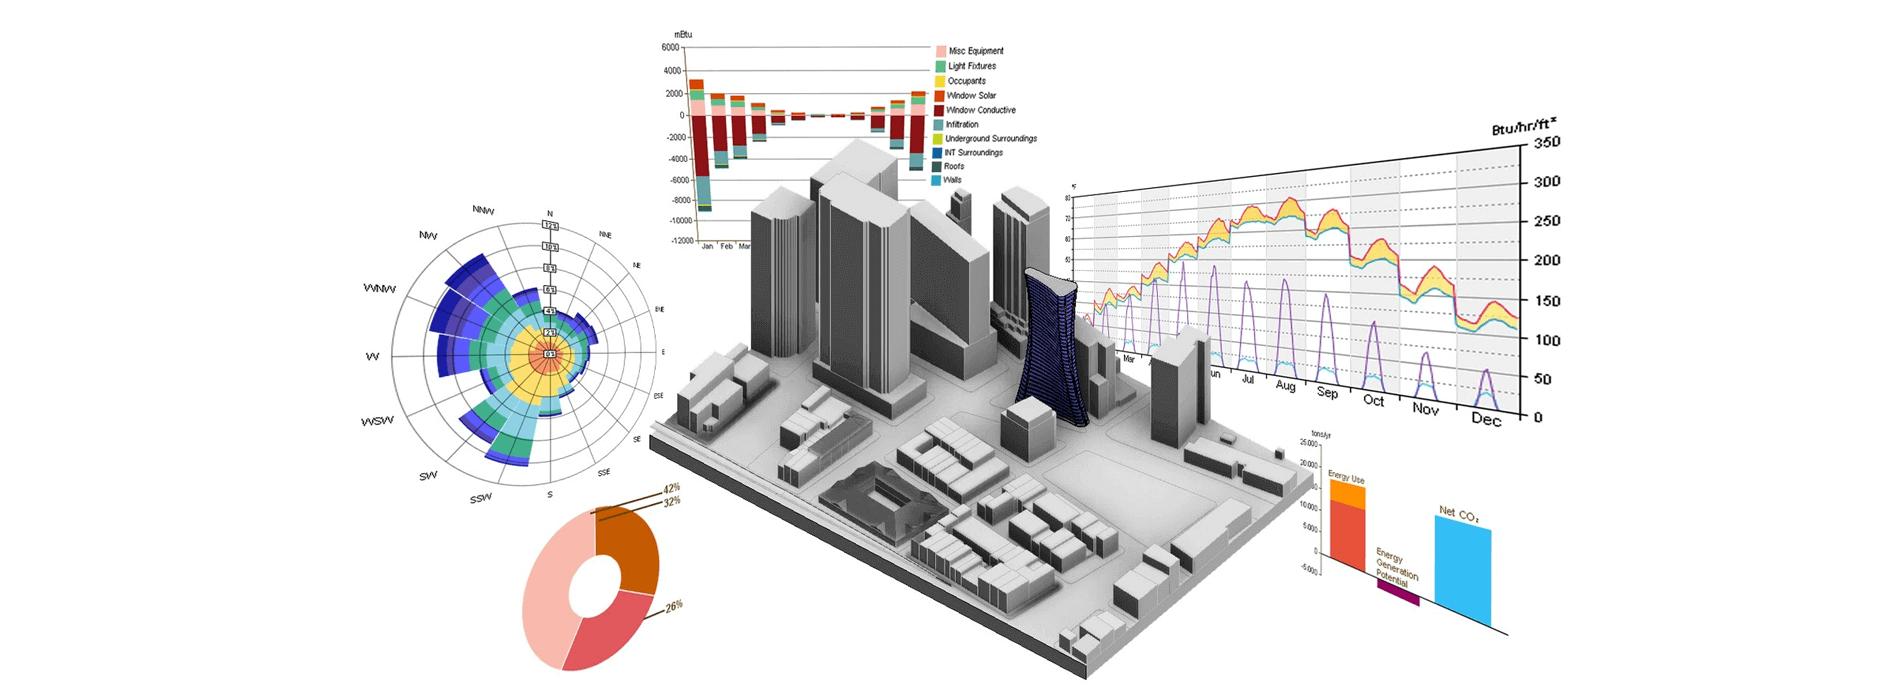 grafiksel-veri-analizi